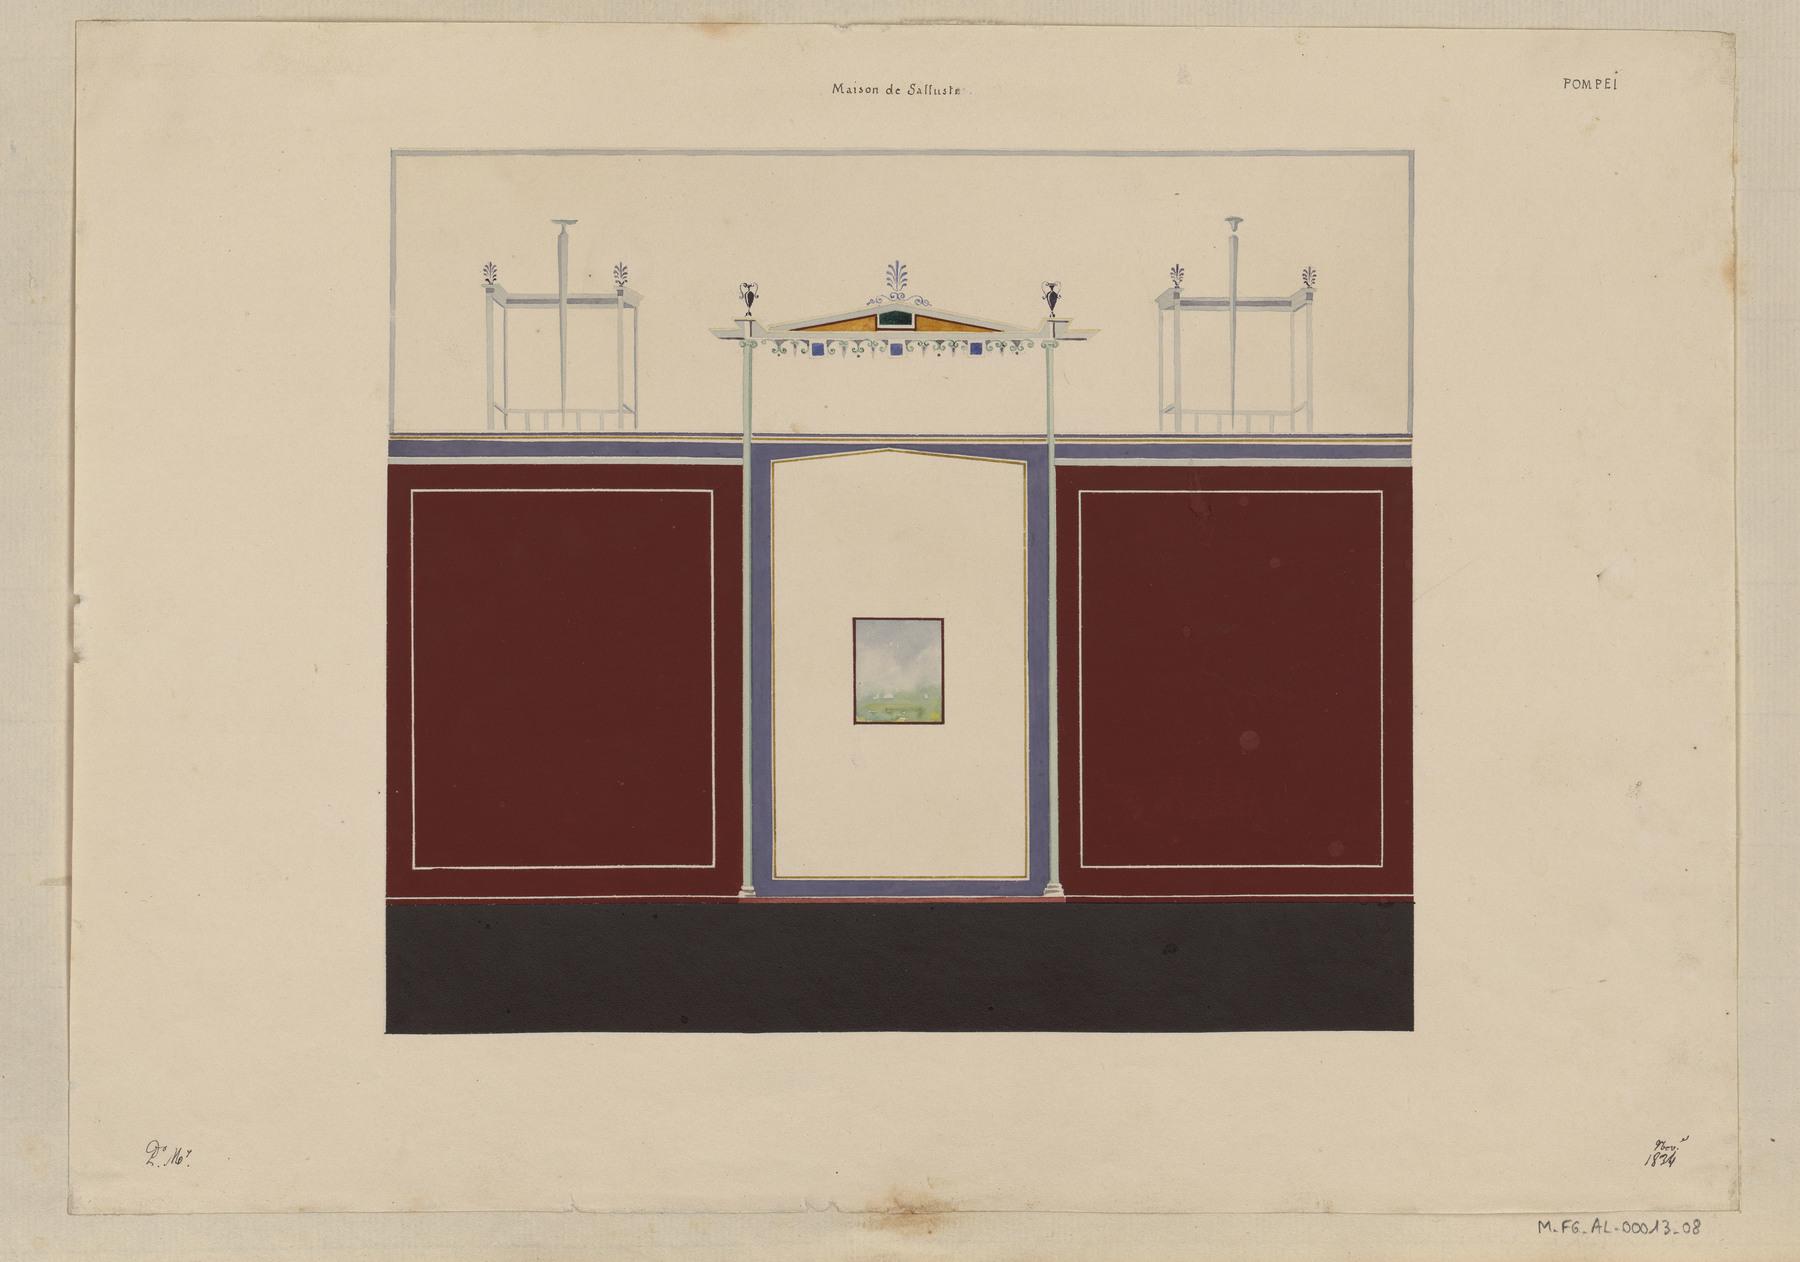 Contenu du Pompéi, Maison de Salluste